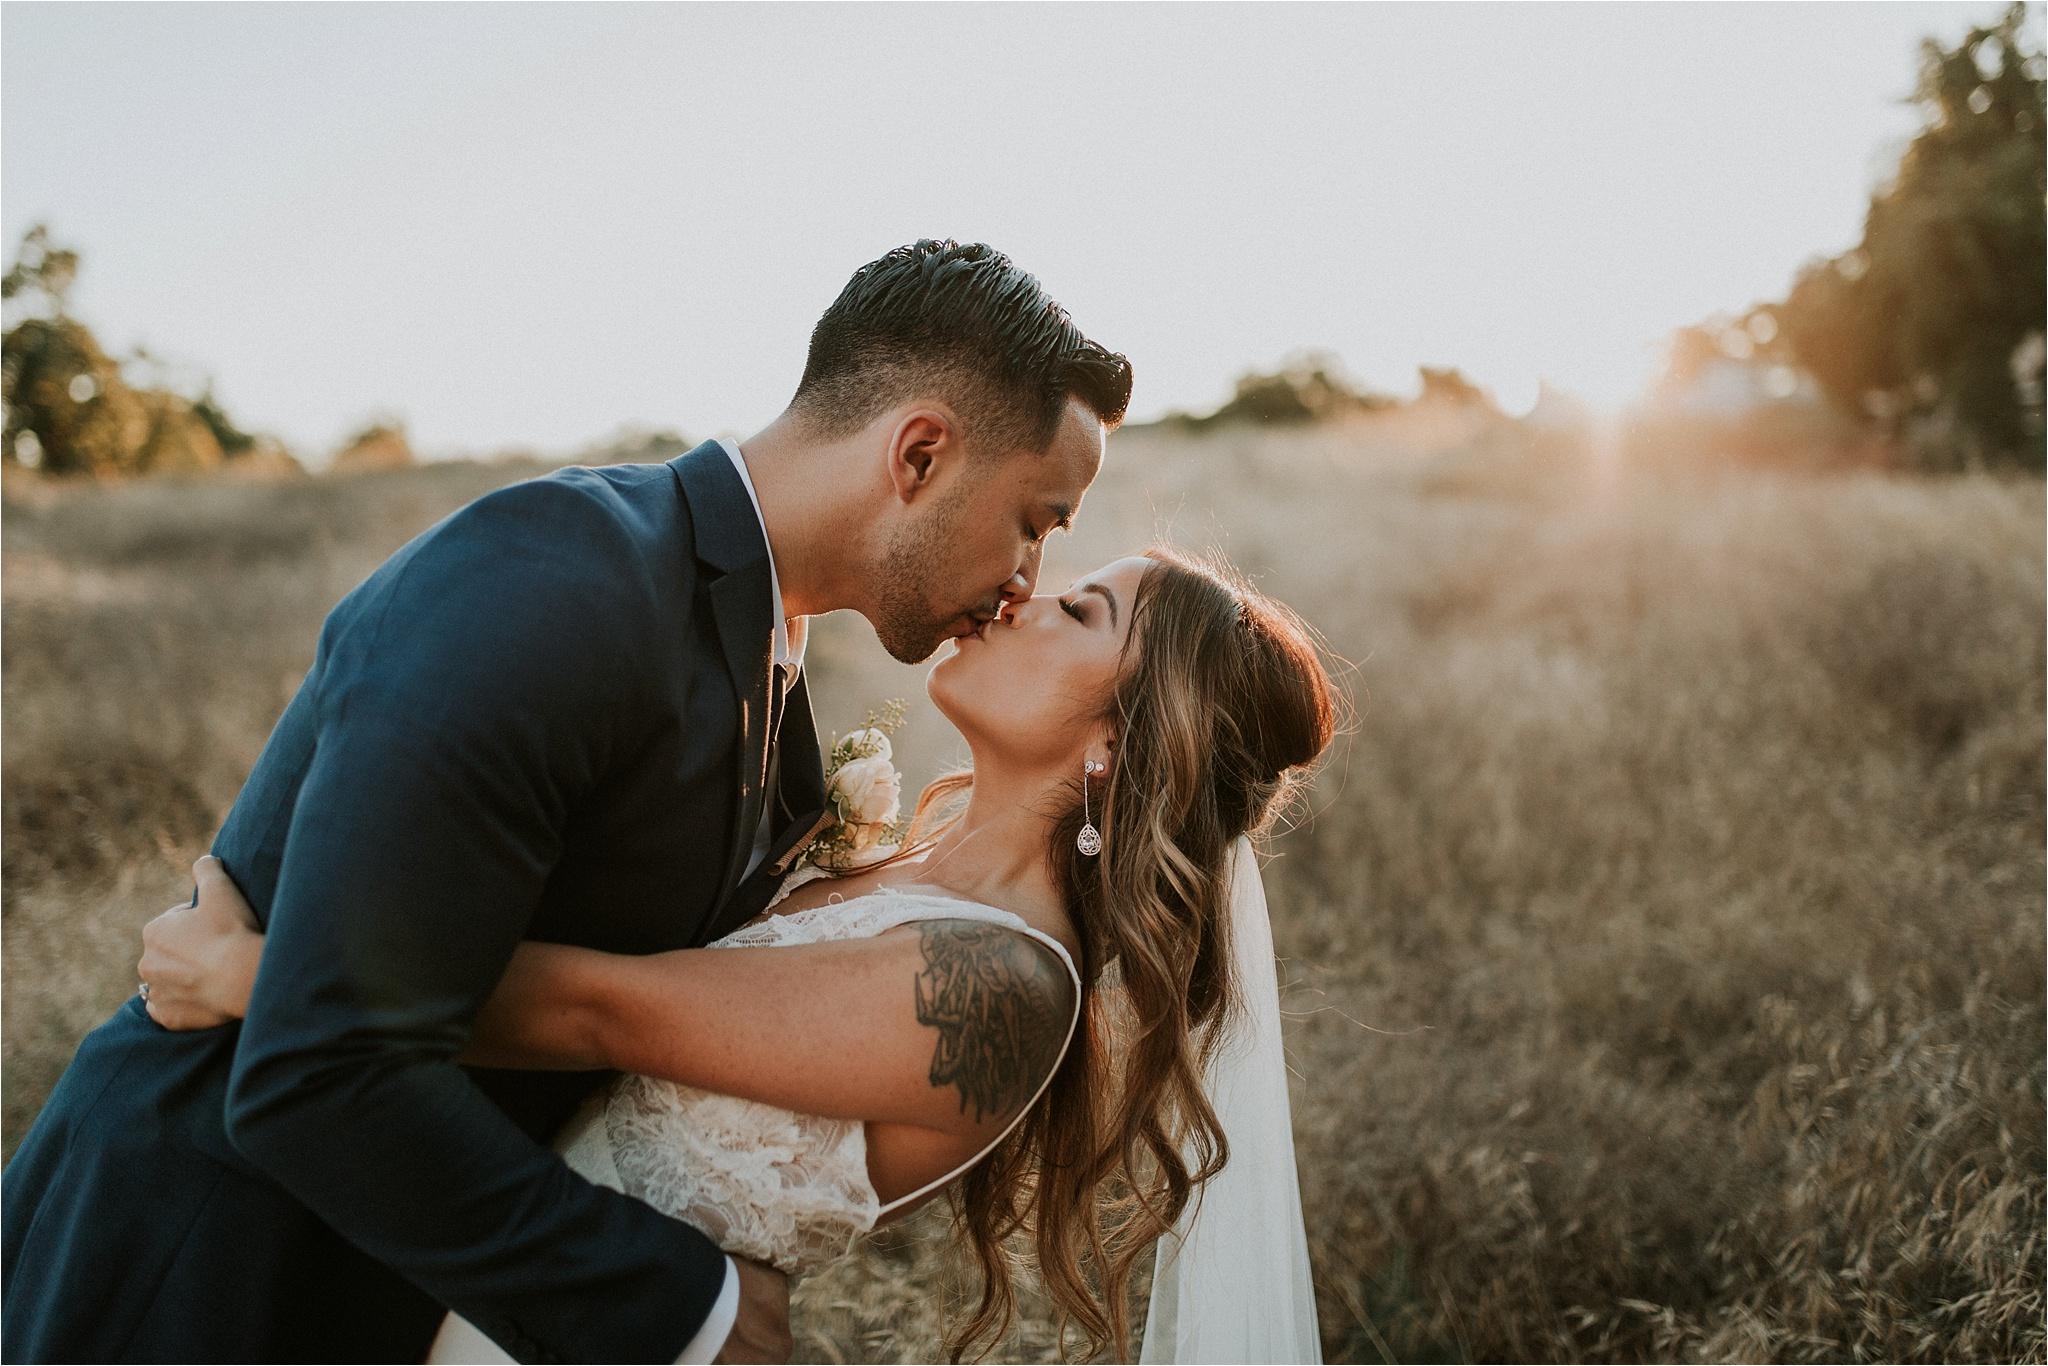 A Brownstone Gardens Wedding in Oakley, CA   Kelli + Nick — Kandace ...